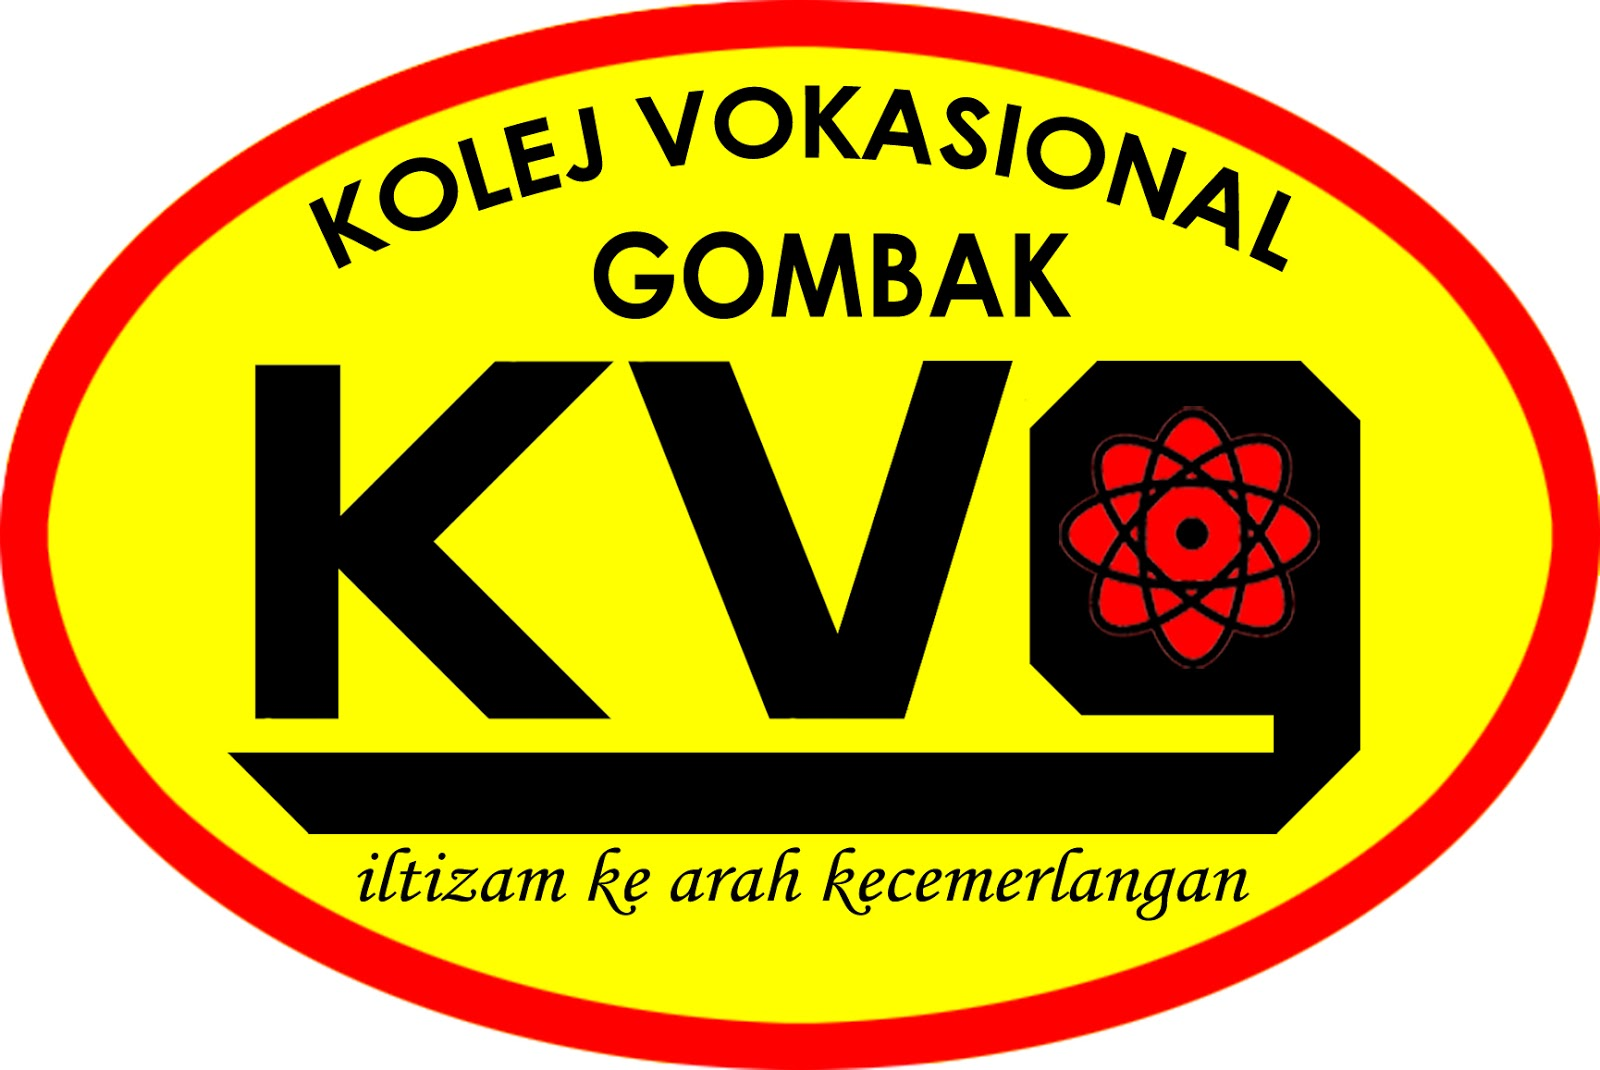 V Frog Kpm Logo Kolej Vokasional ...